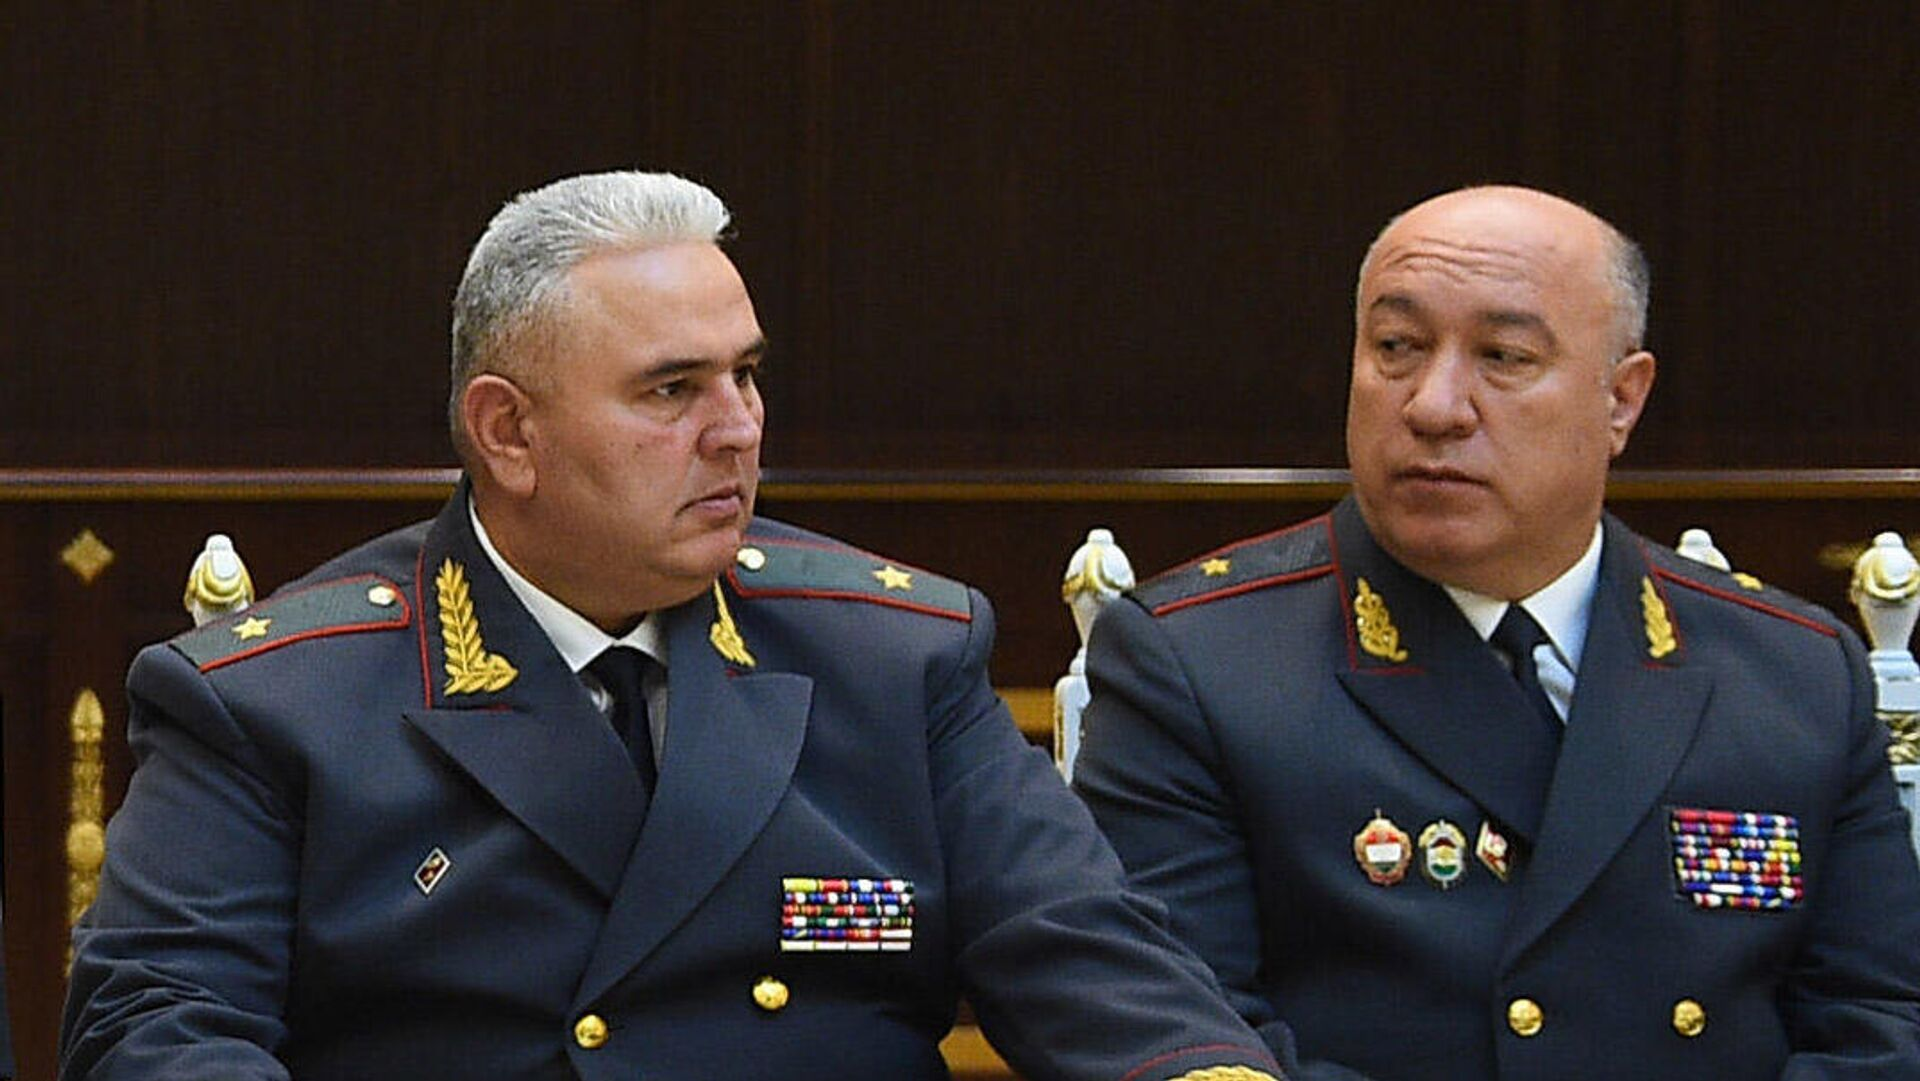 Генерал Нурилло Орифзода (Справа) и генерал Искандарзода Мухаммадшох (слева) - Sputnik Таджикистан, 1920, 13.07.2021